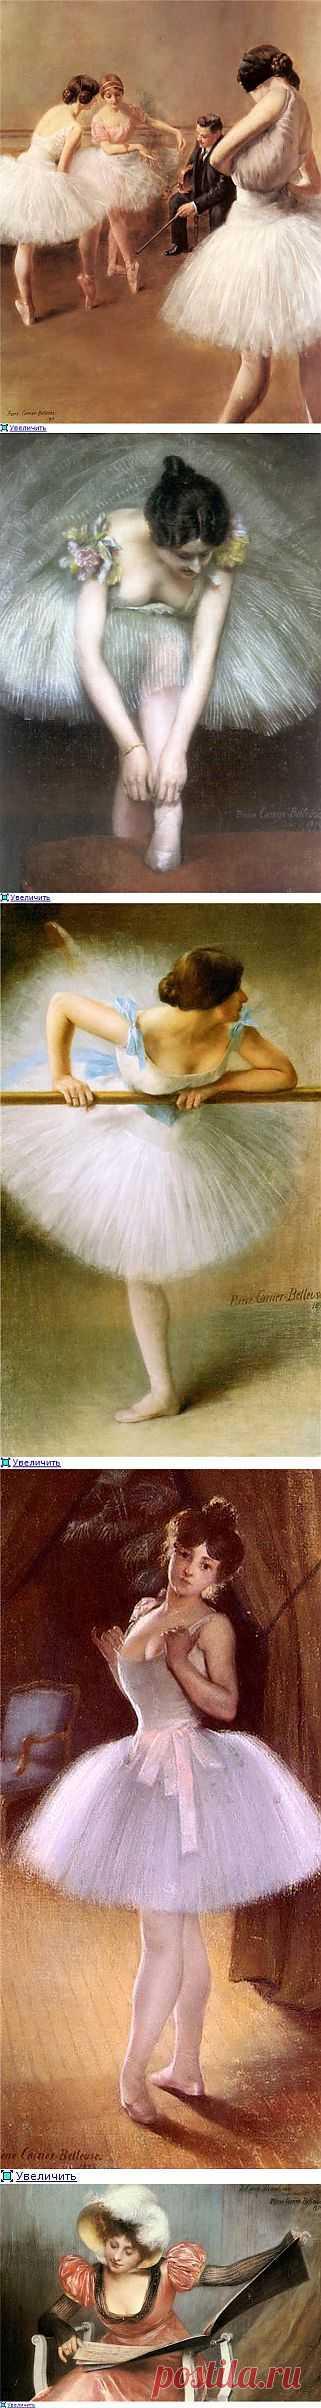 Красавицы французского художника Pierre Carrier-Belleuse (1851-1932).